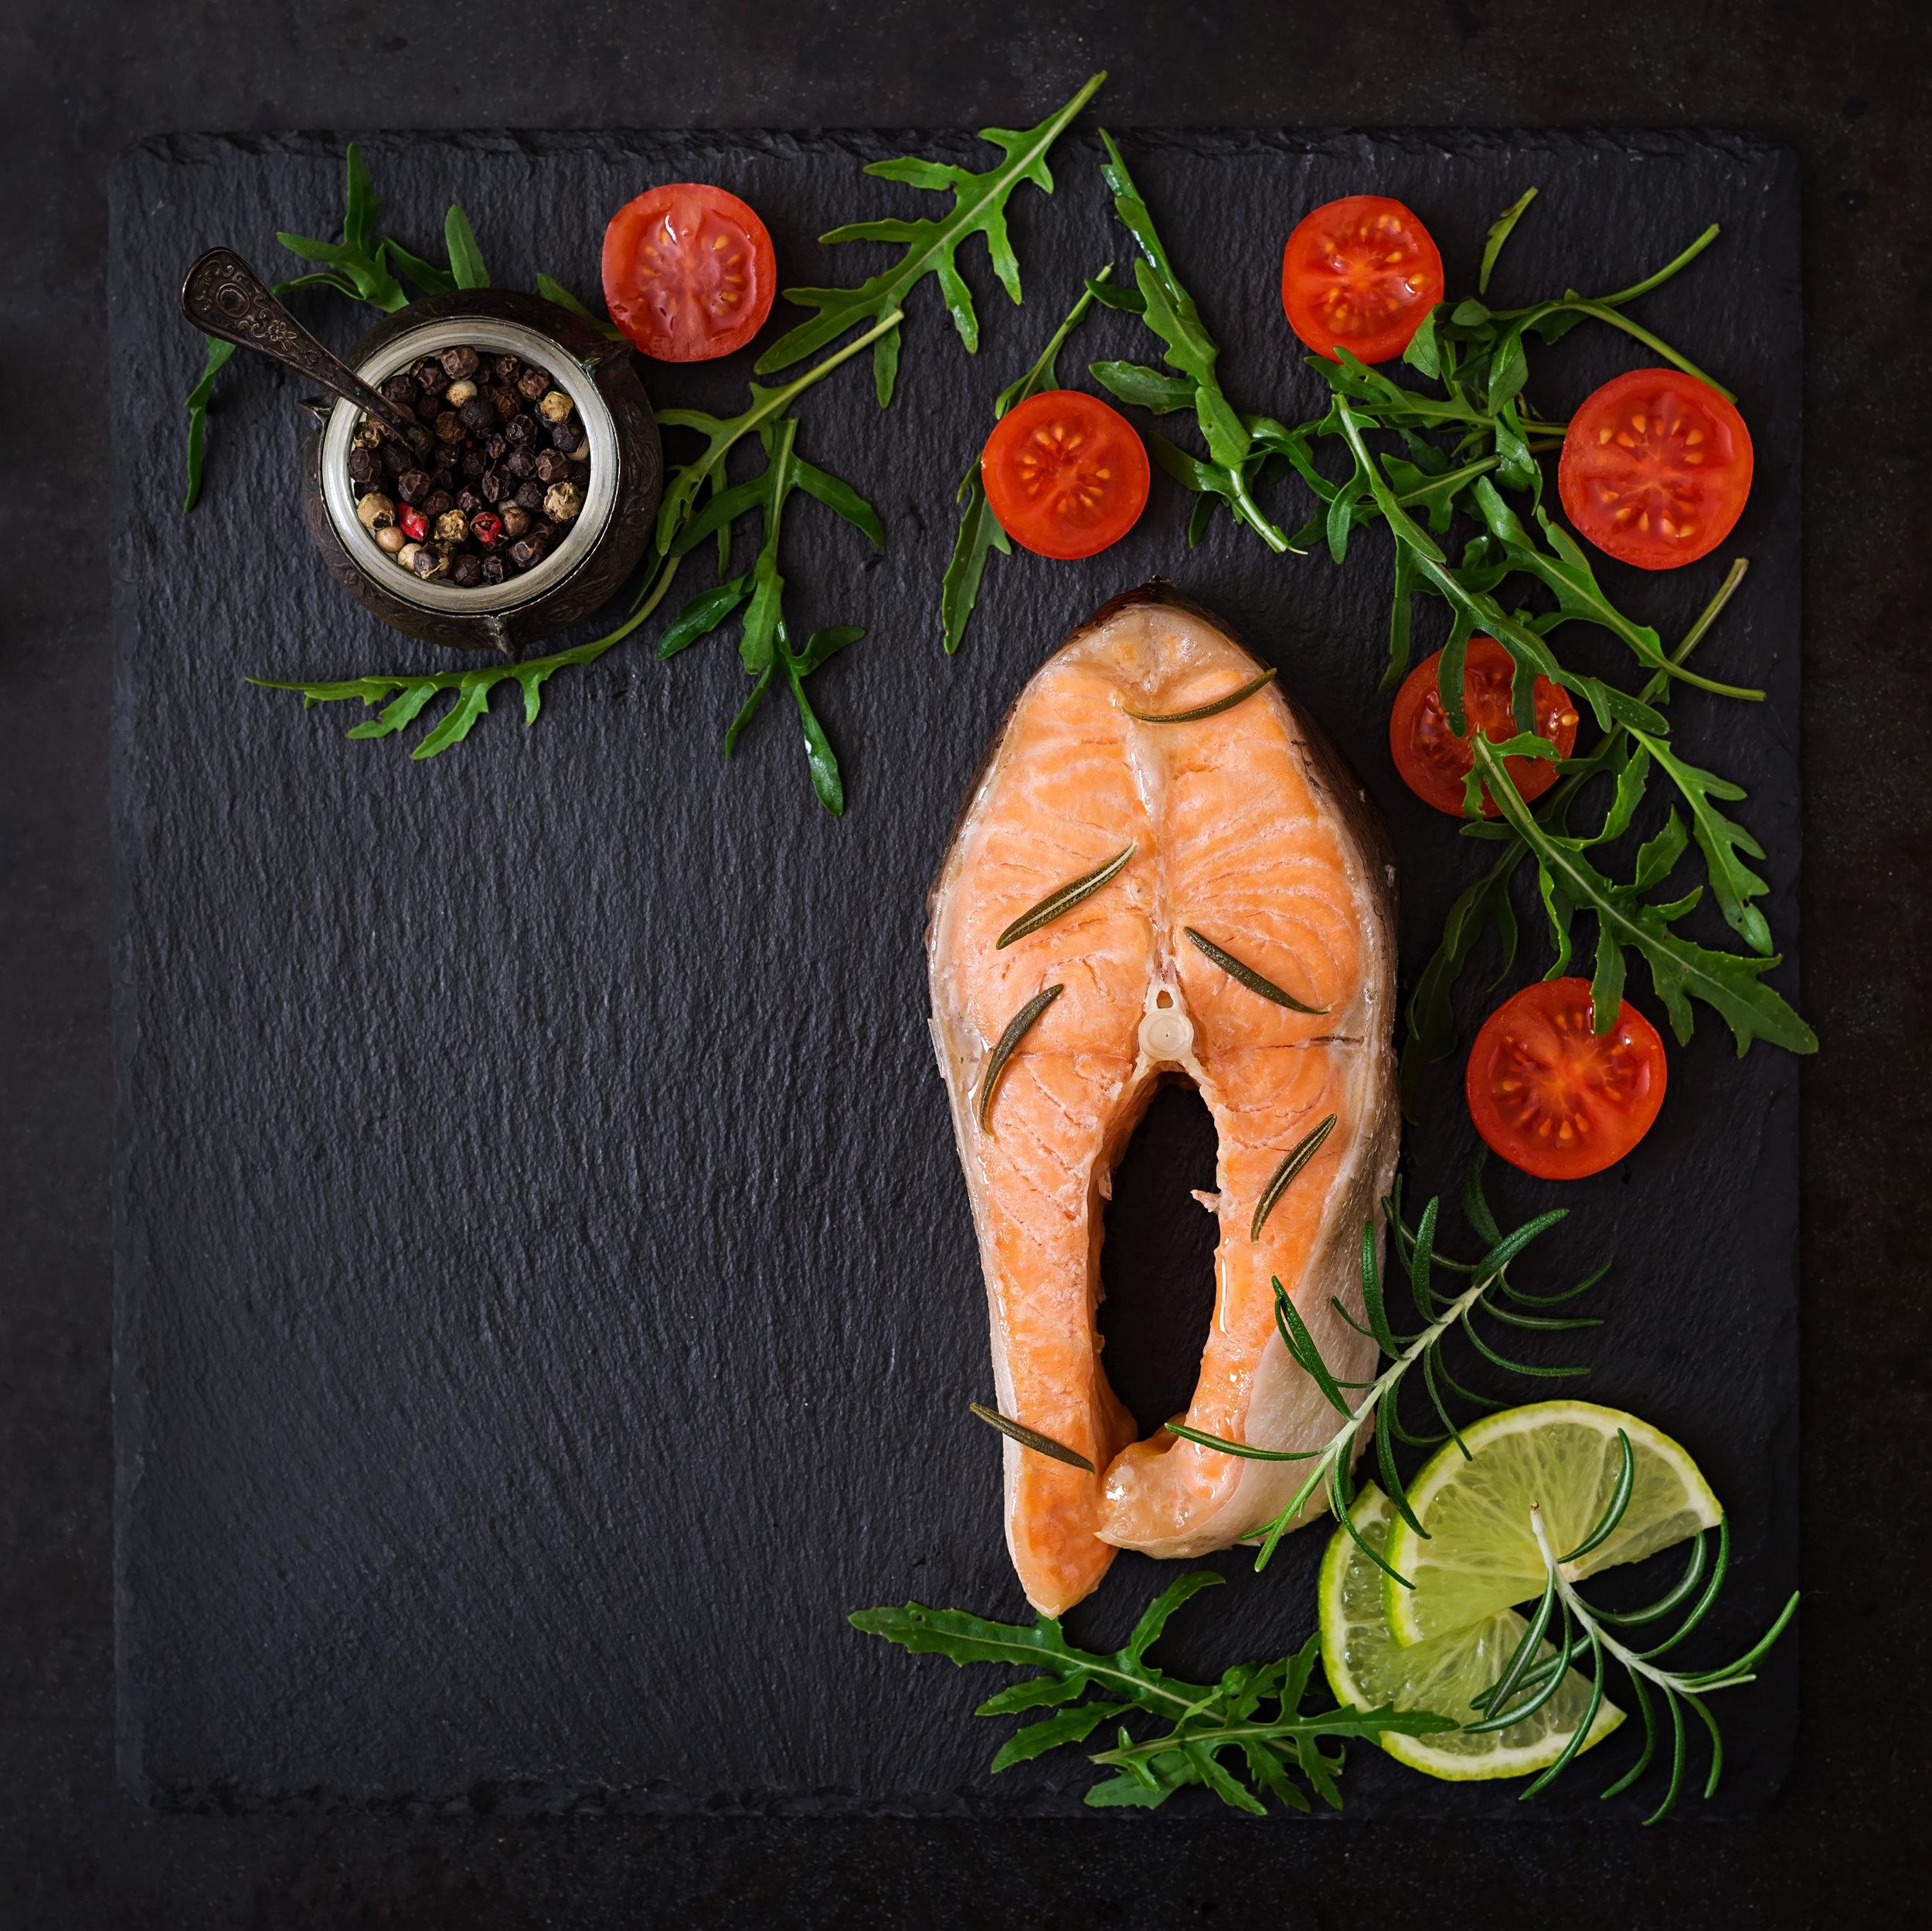 cooked-on-steam-salmon-steak-with-vegetables-on-PJ7NUAN.jpg